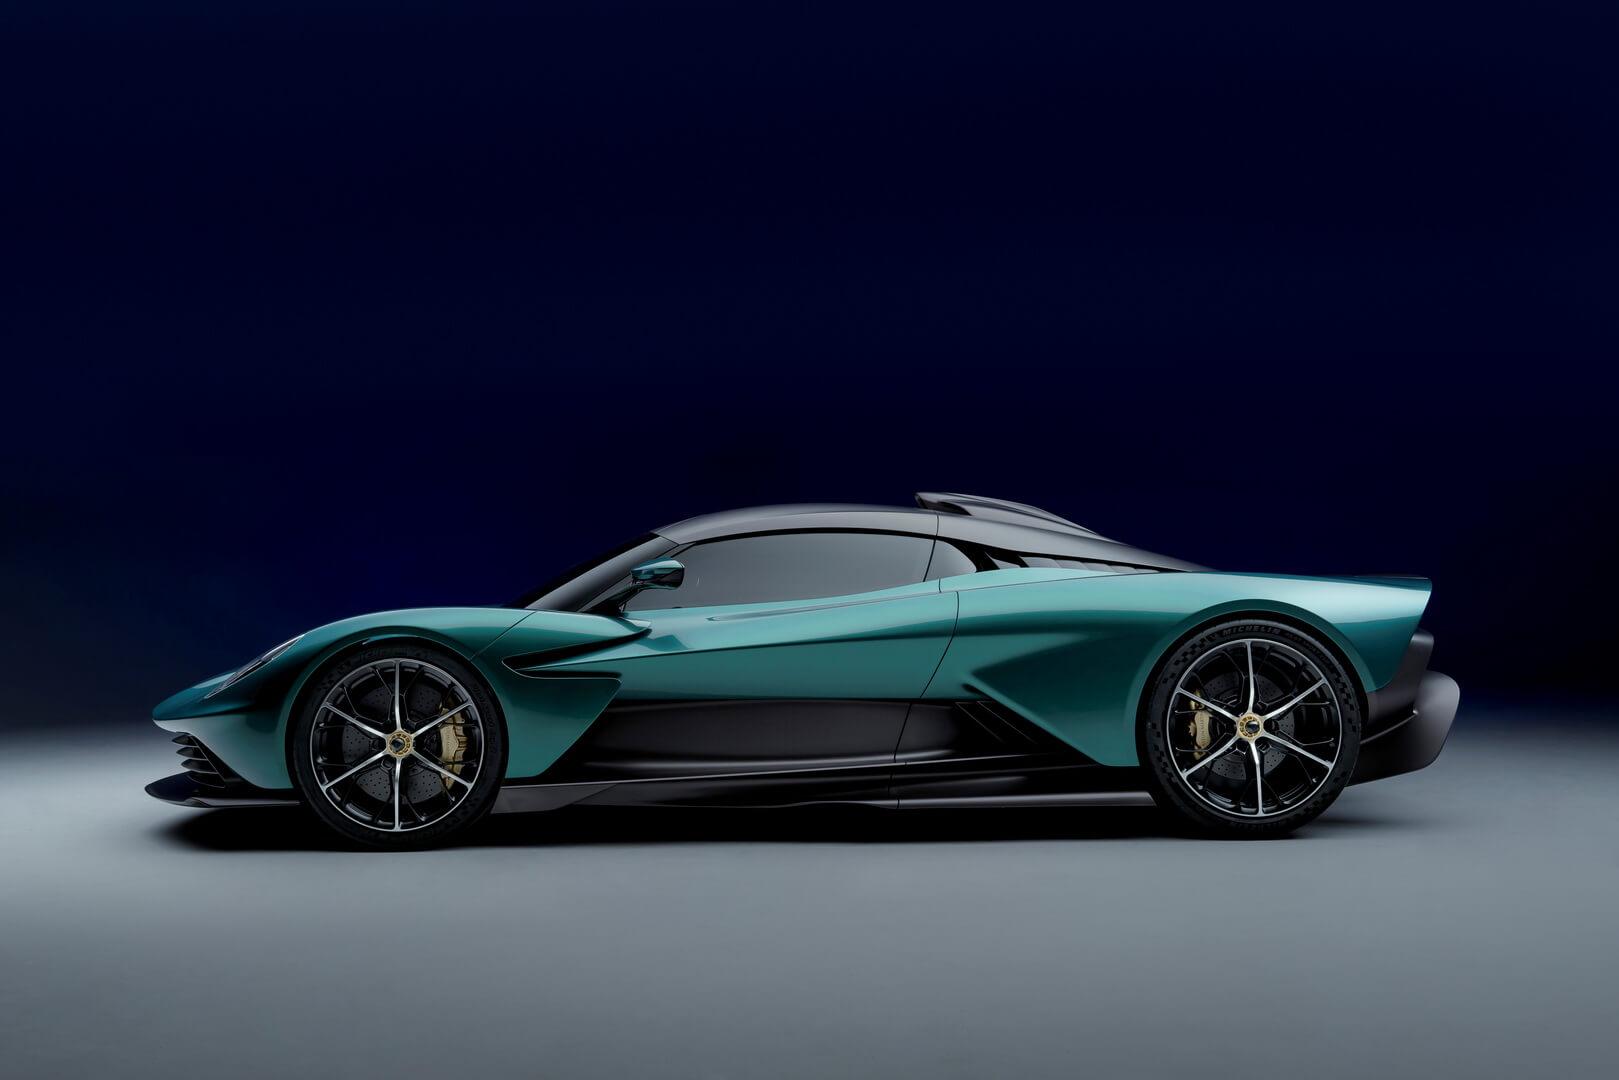 Aston Martin представил 950-сильный гибридный гиперкар Valhalla